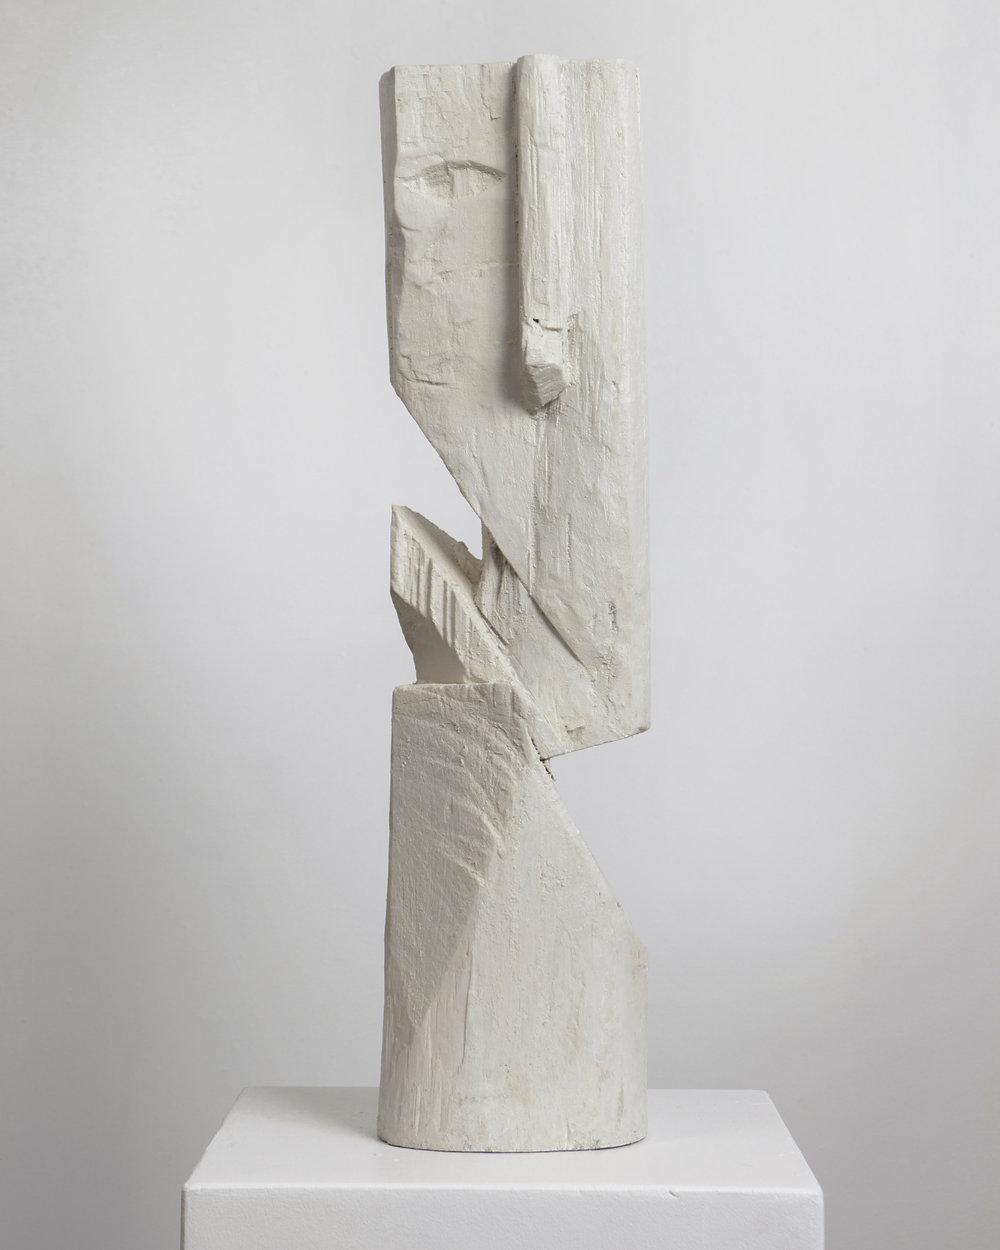 Sculpture 3, 2017